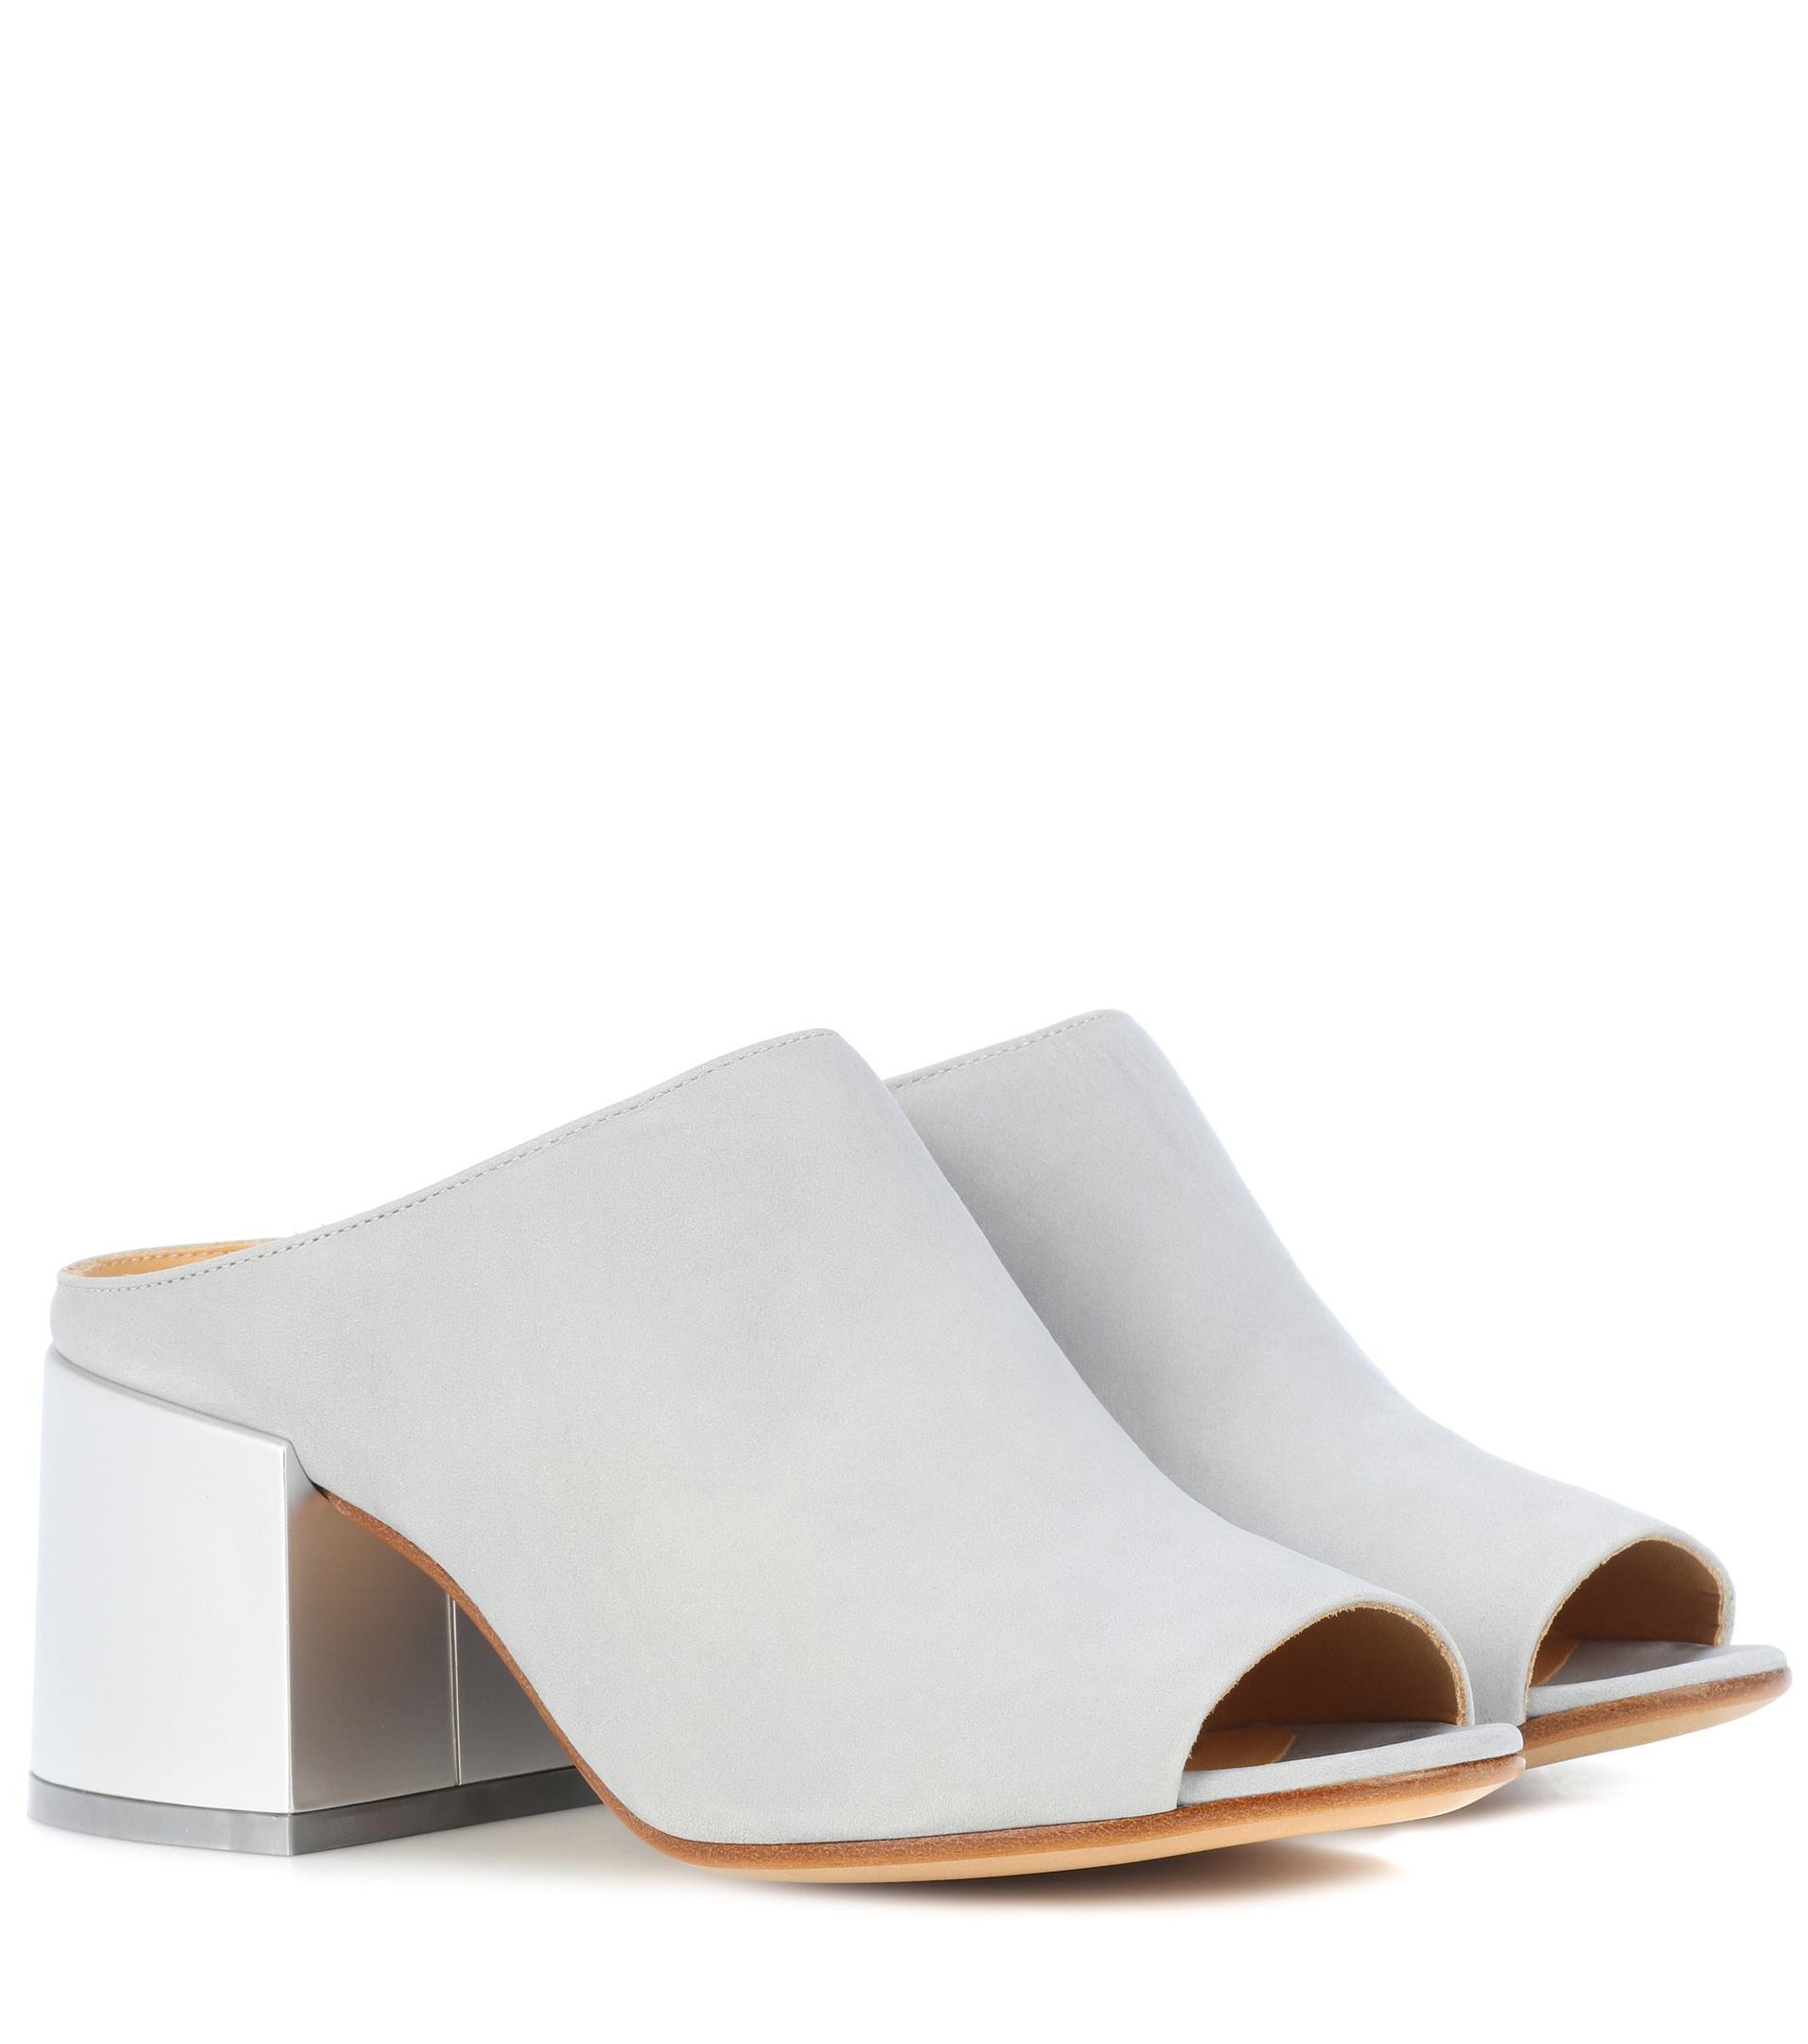 MM6 MAISON MARGIELA Suede sandals J0i6pI4VQ